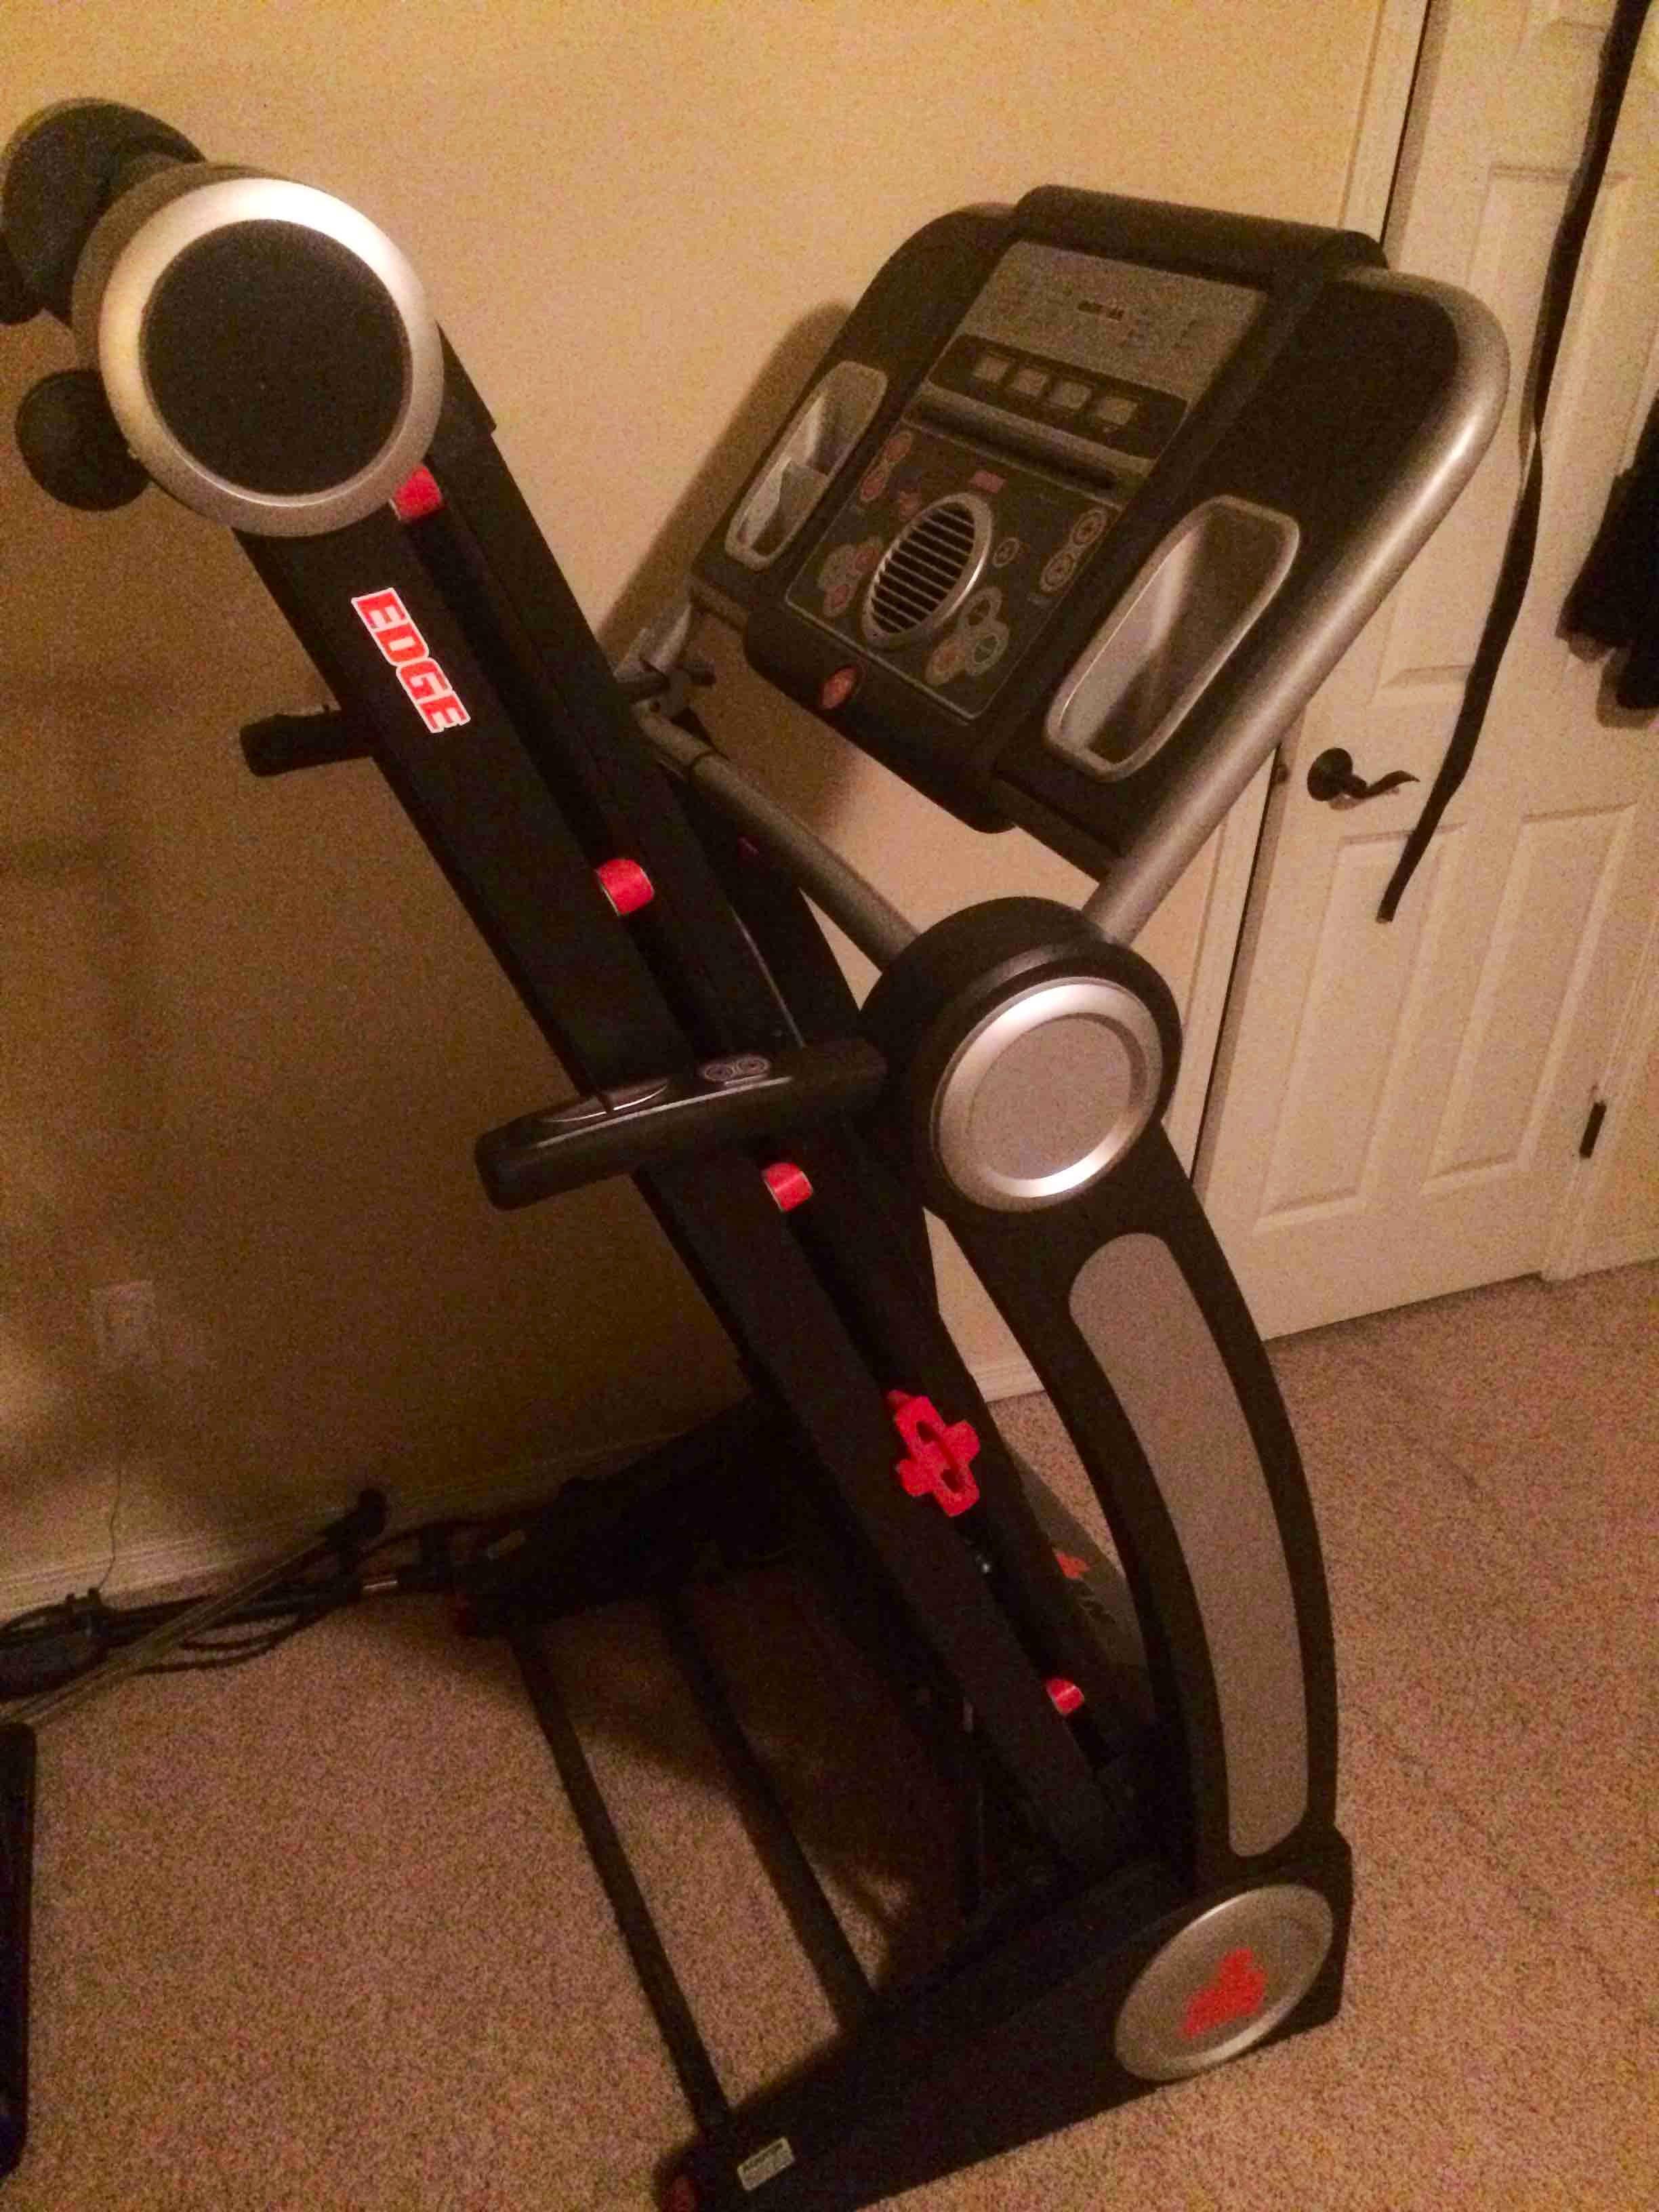 Ironman Treadmill